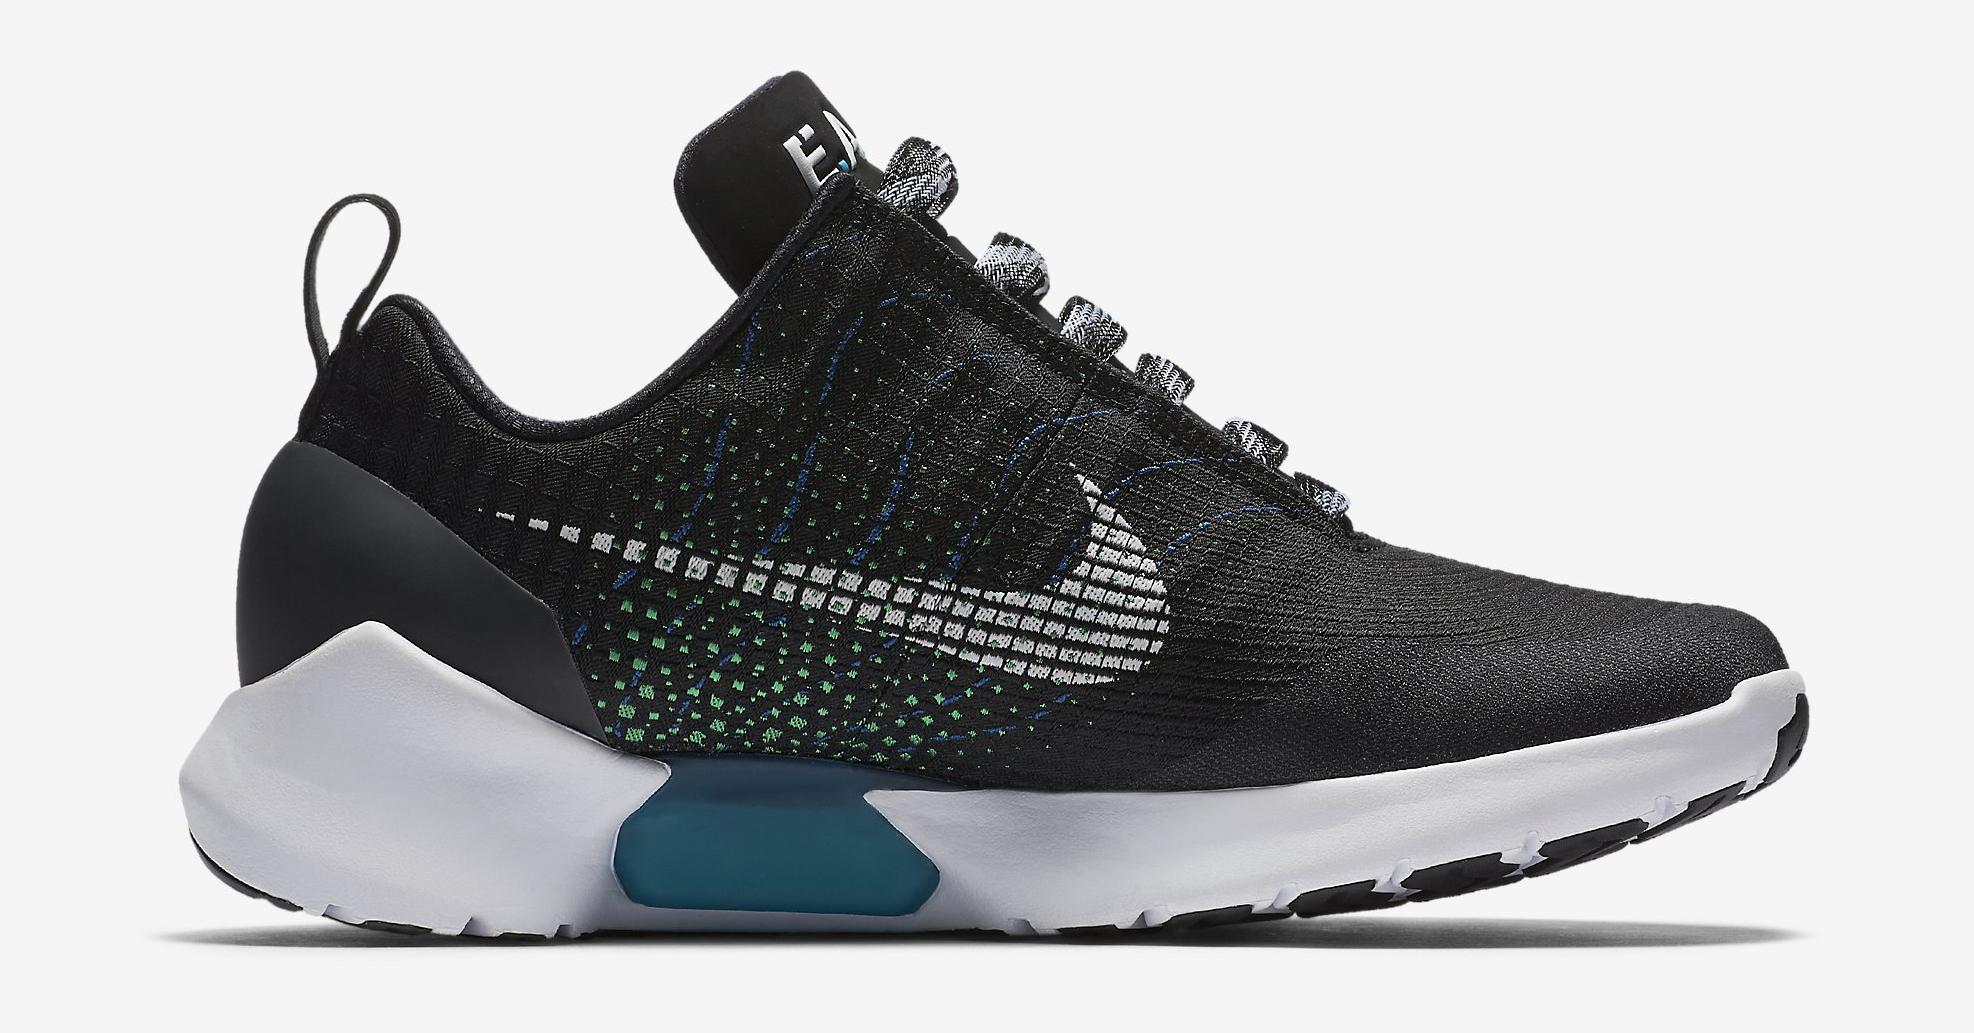 Nike Hyperadapt 843871-001 Medial